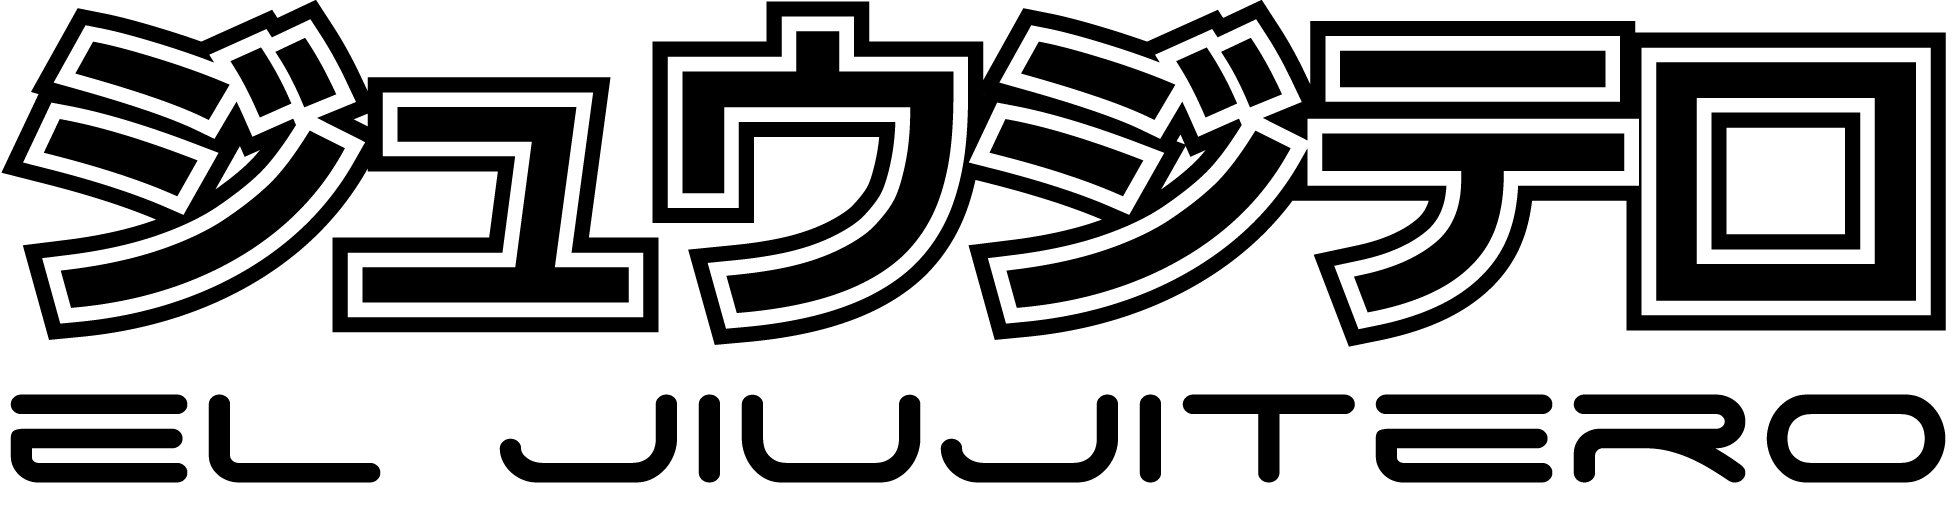 El Jiujitero